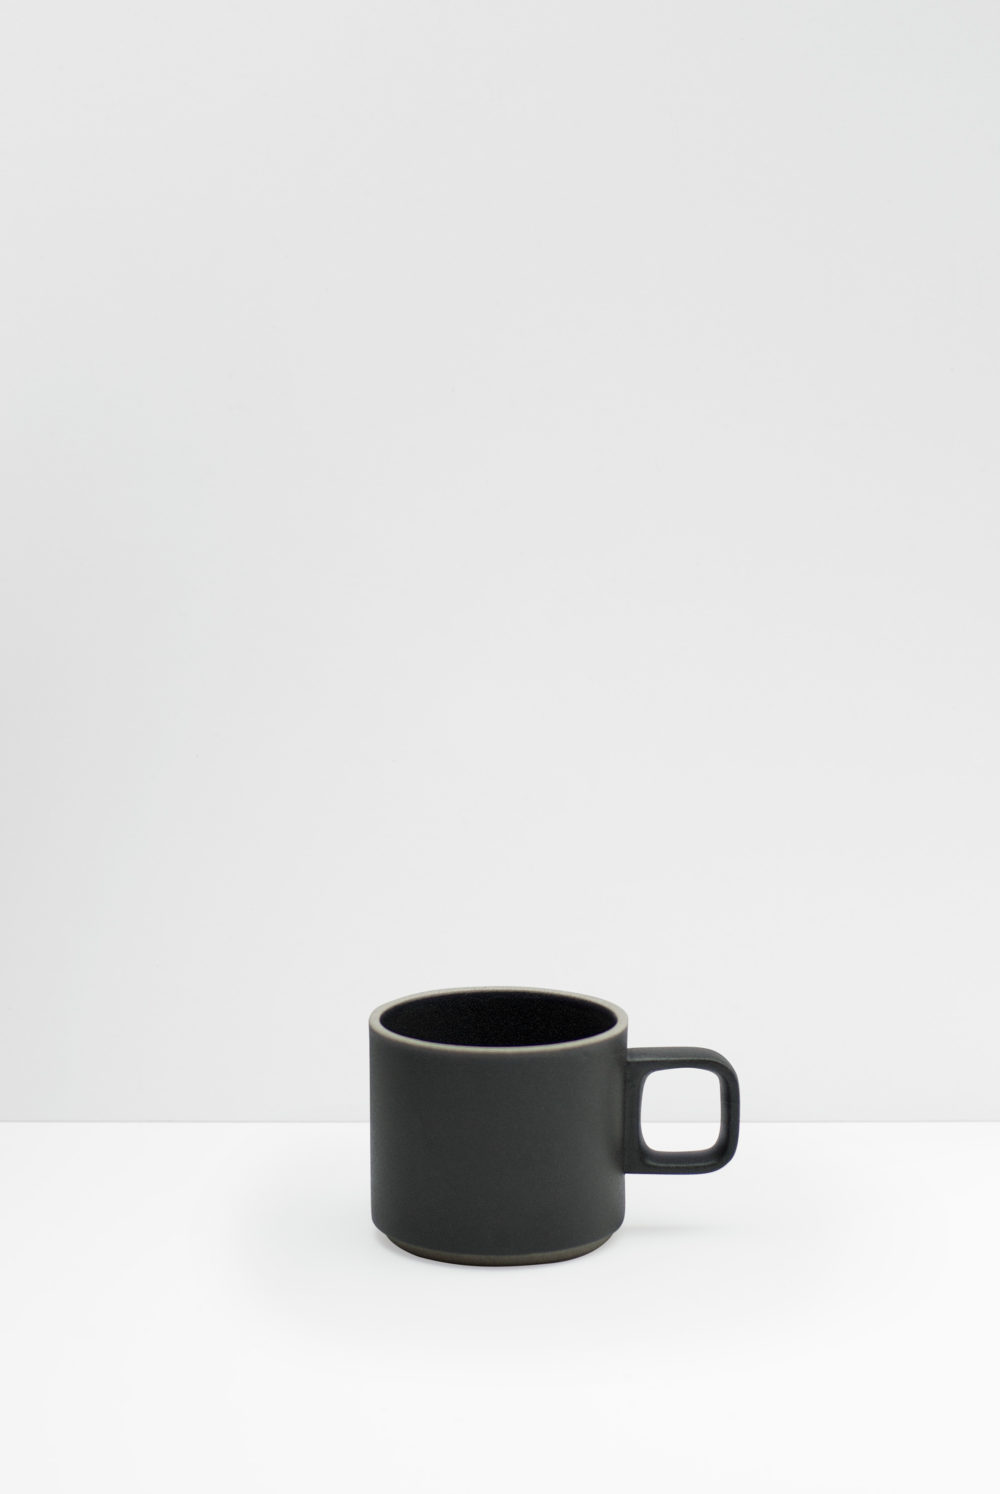 Hasami Porcelain Coffee Mug Small